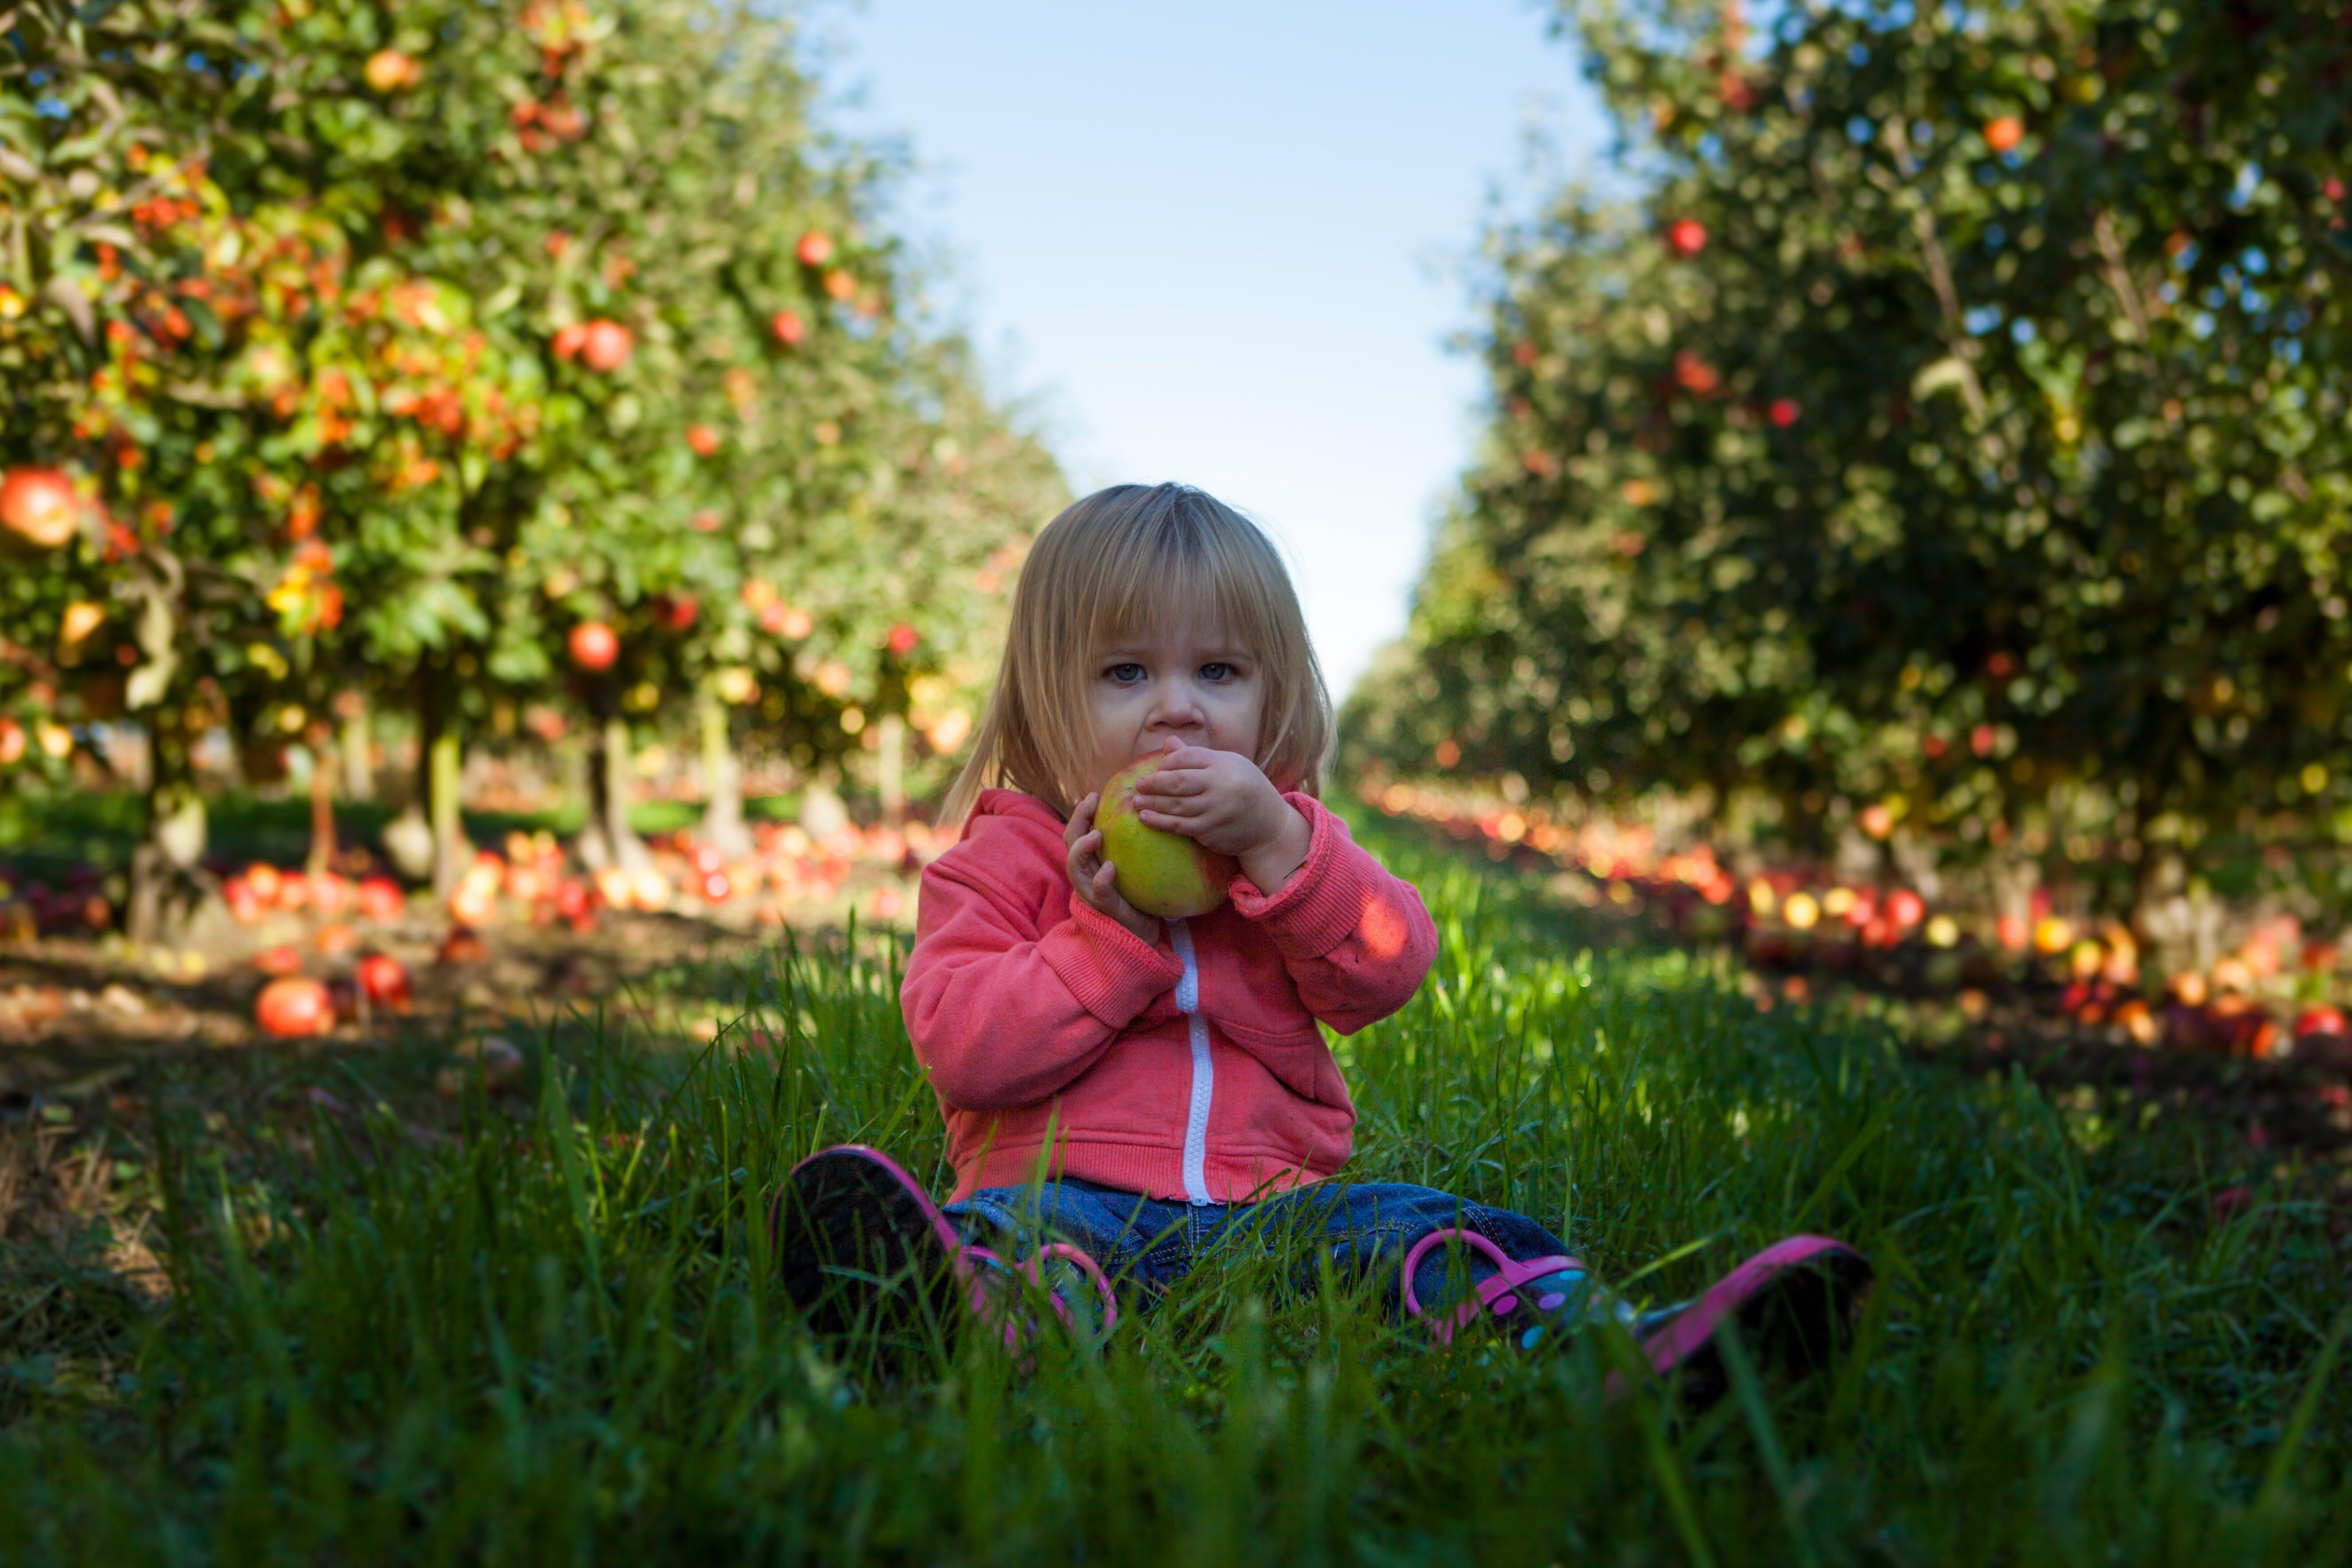 little girl biting into an apple